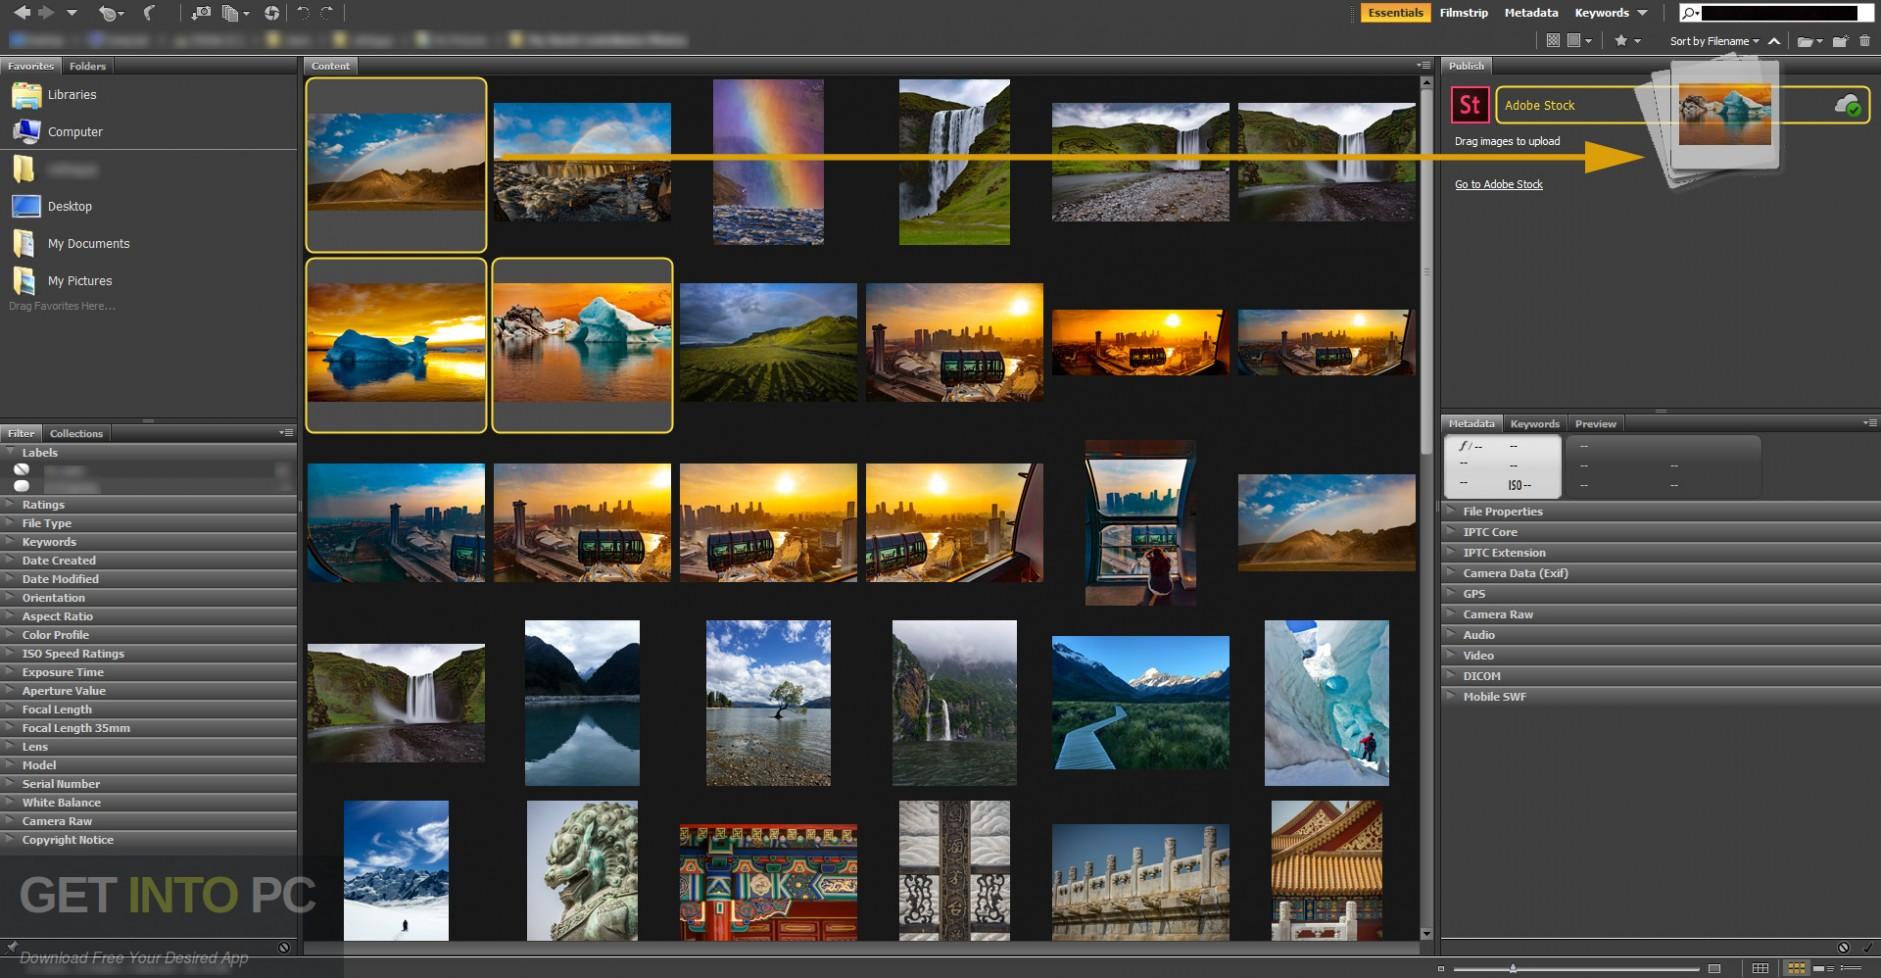 Adobe Bridge CC 2018 Latest Version Download-GetintoPC.com